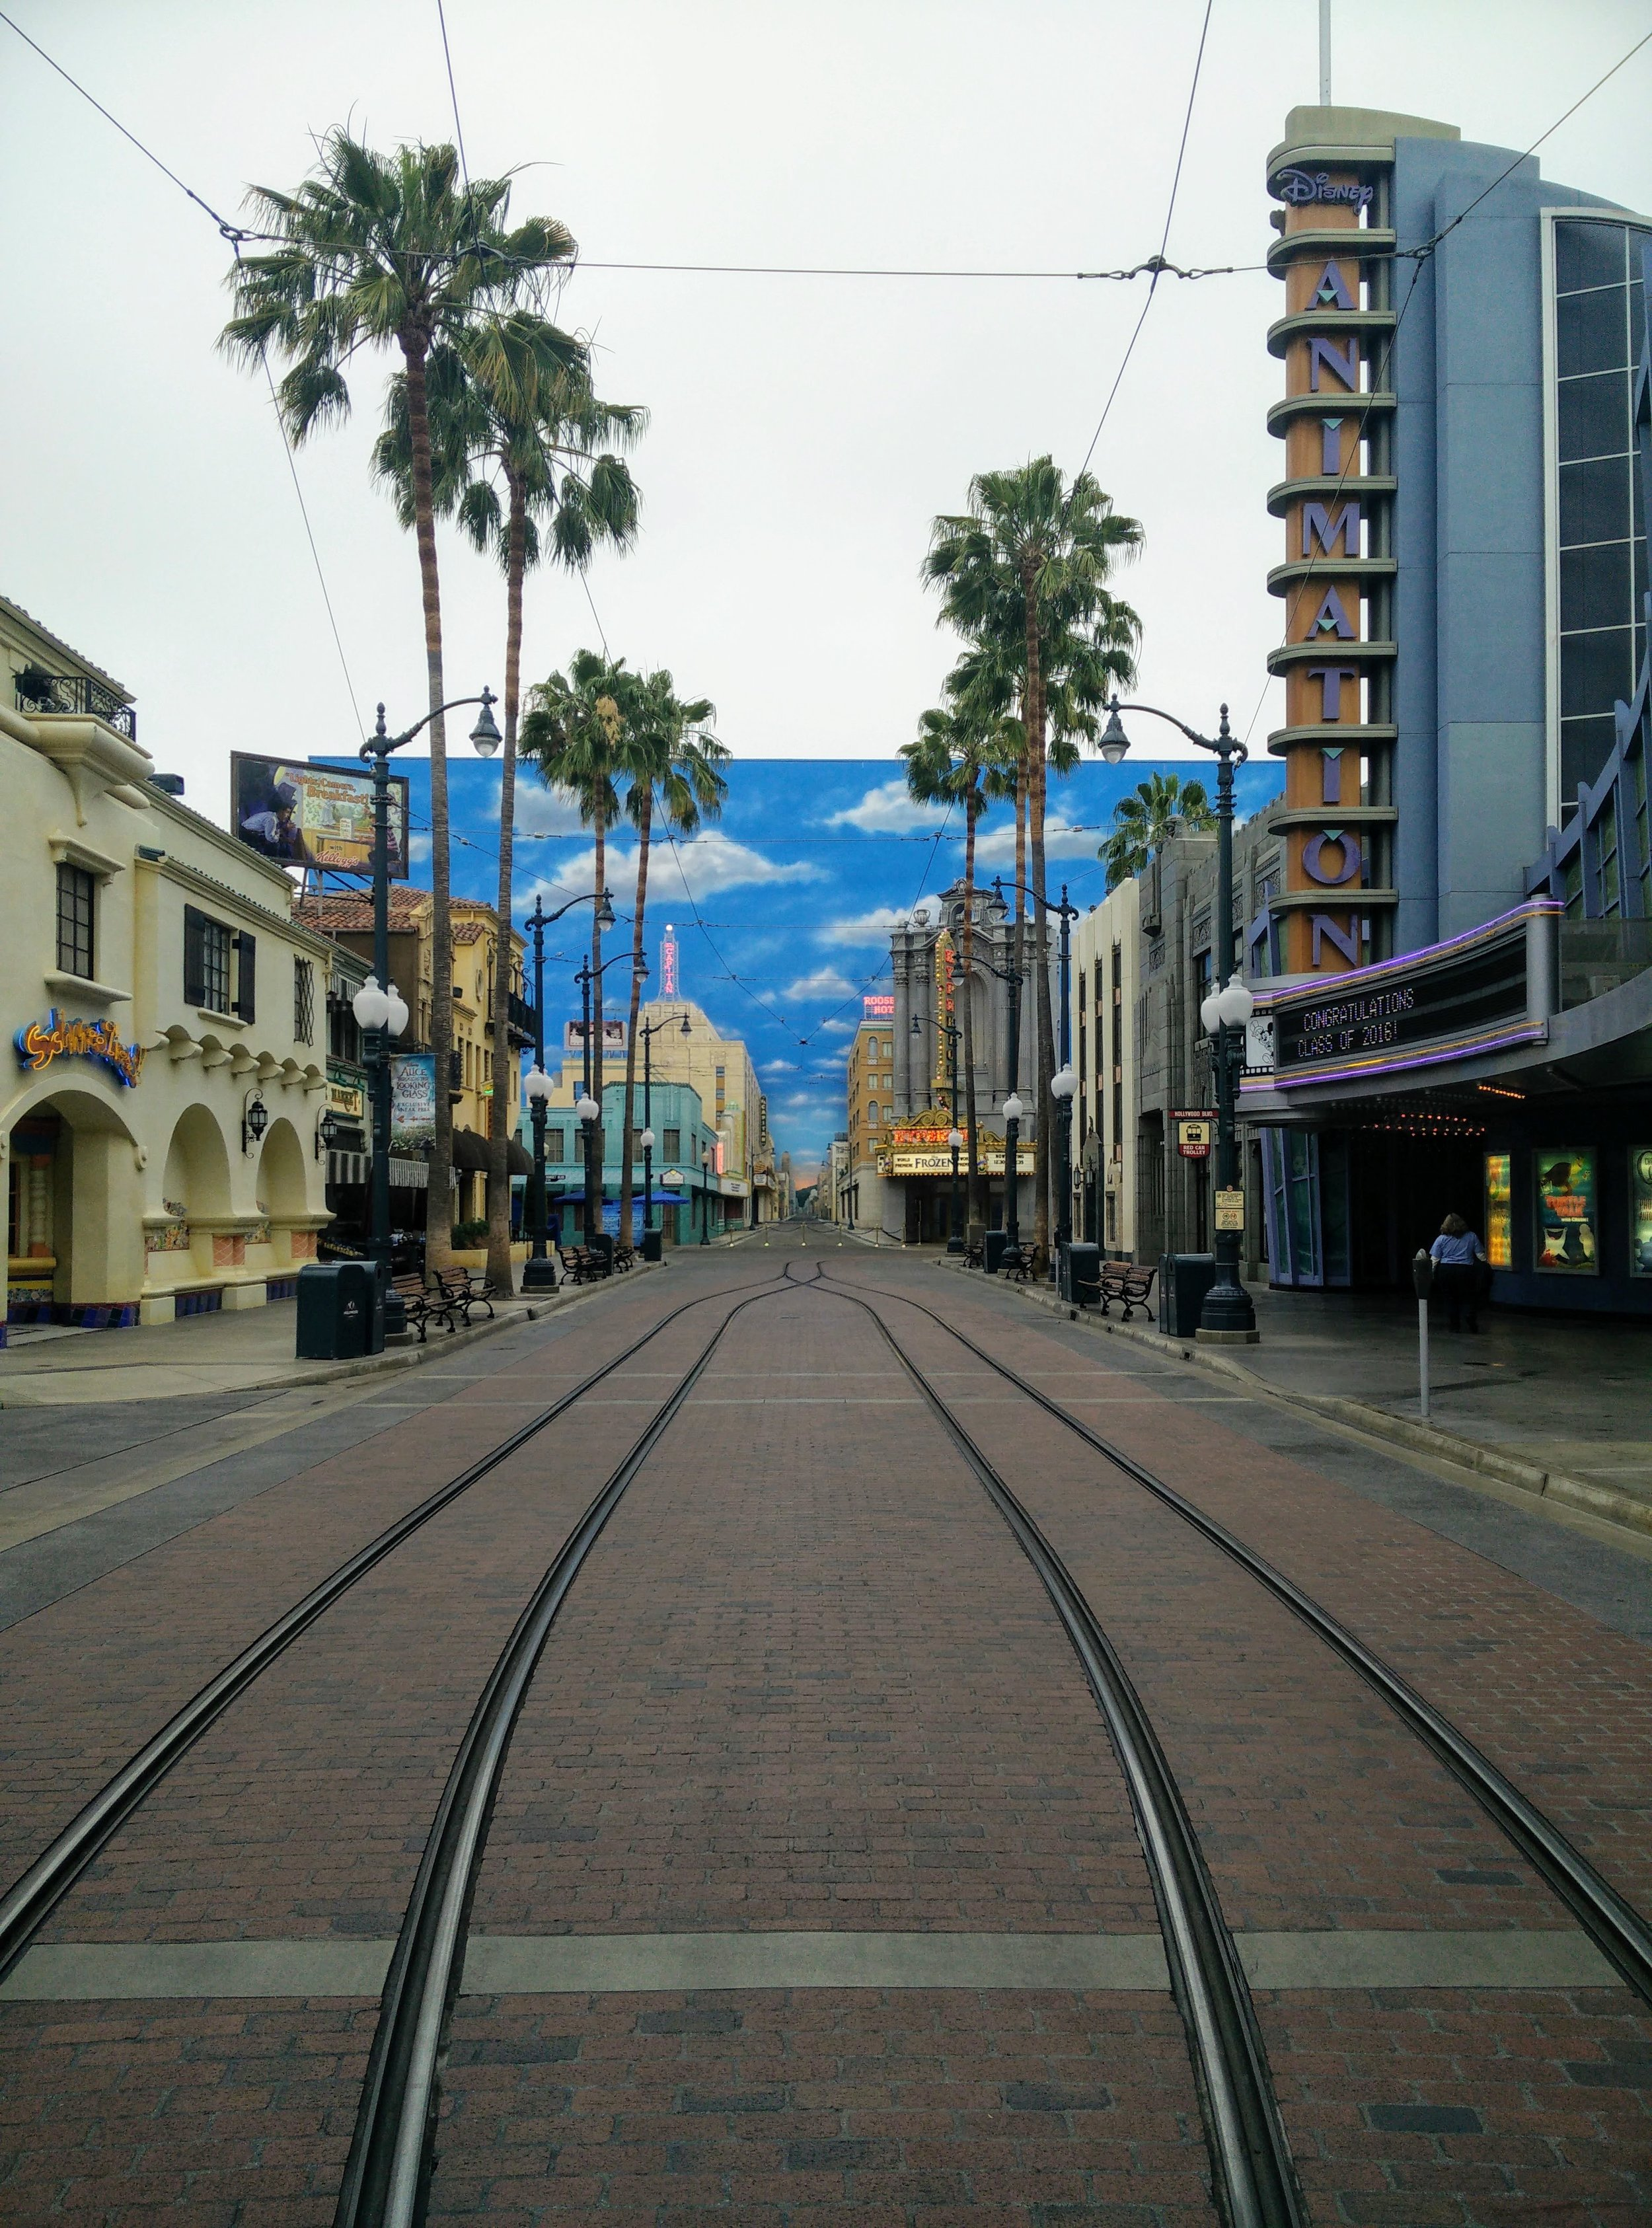 Hollywood Land - Disney California Adventure